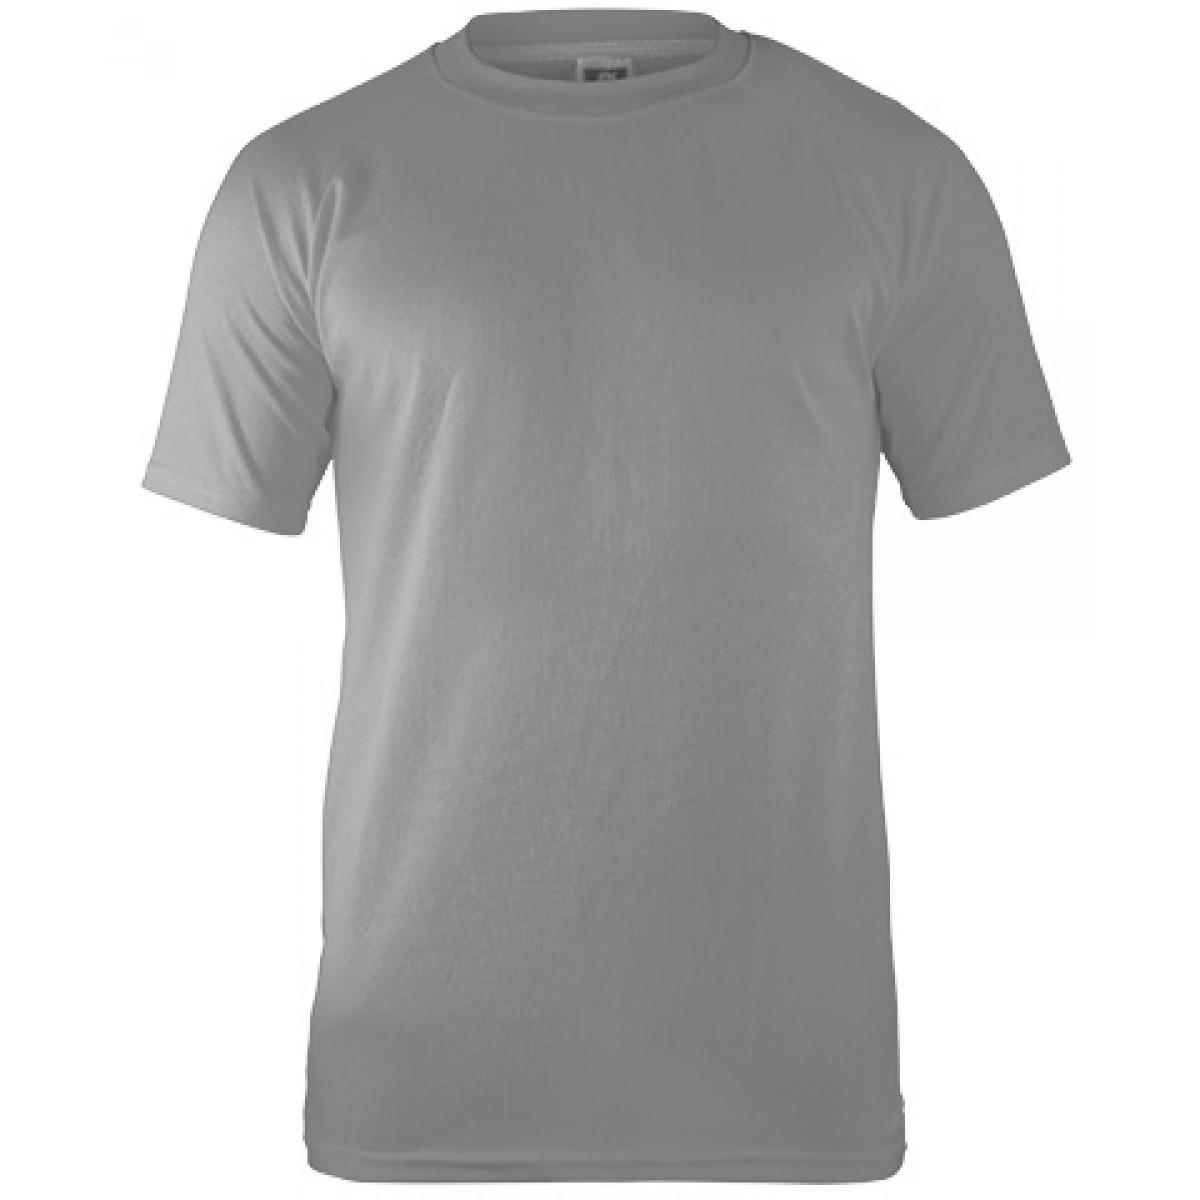 Performance T-shirt-Gray -YM